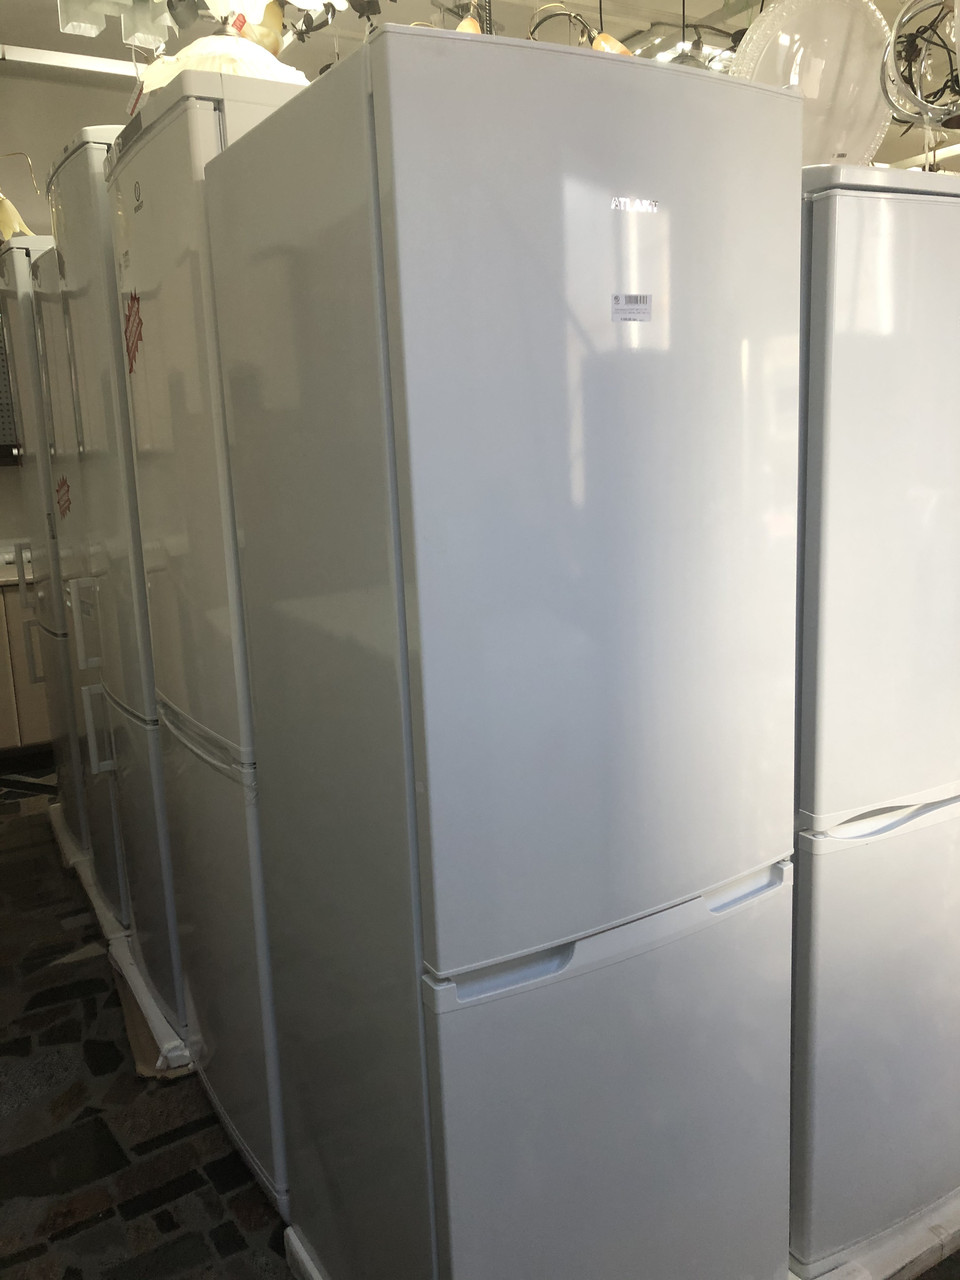 Холодильник АТЛАНТ ХМ 4721-101 (1,82м, 211/115, мор.низ, 3плк, 1кмп, А+)